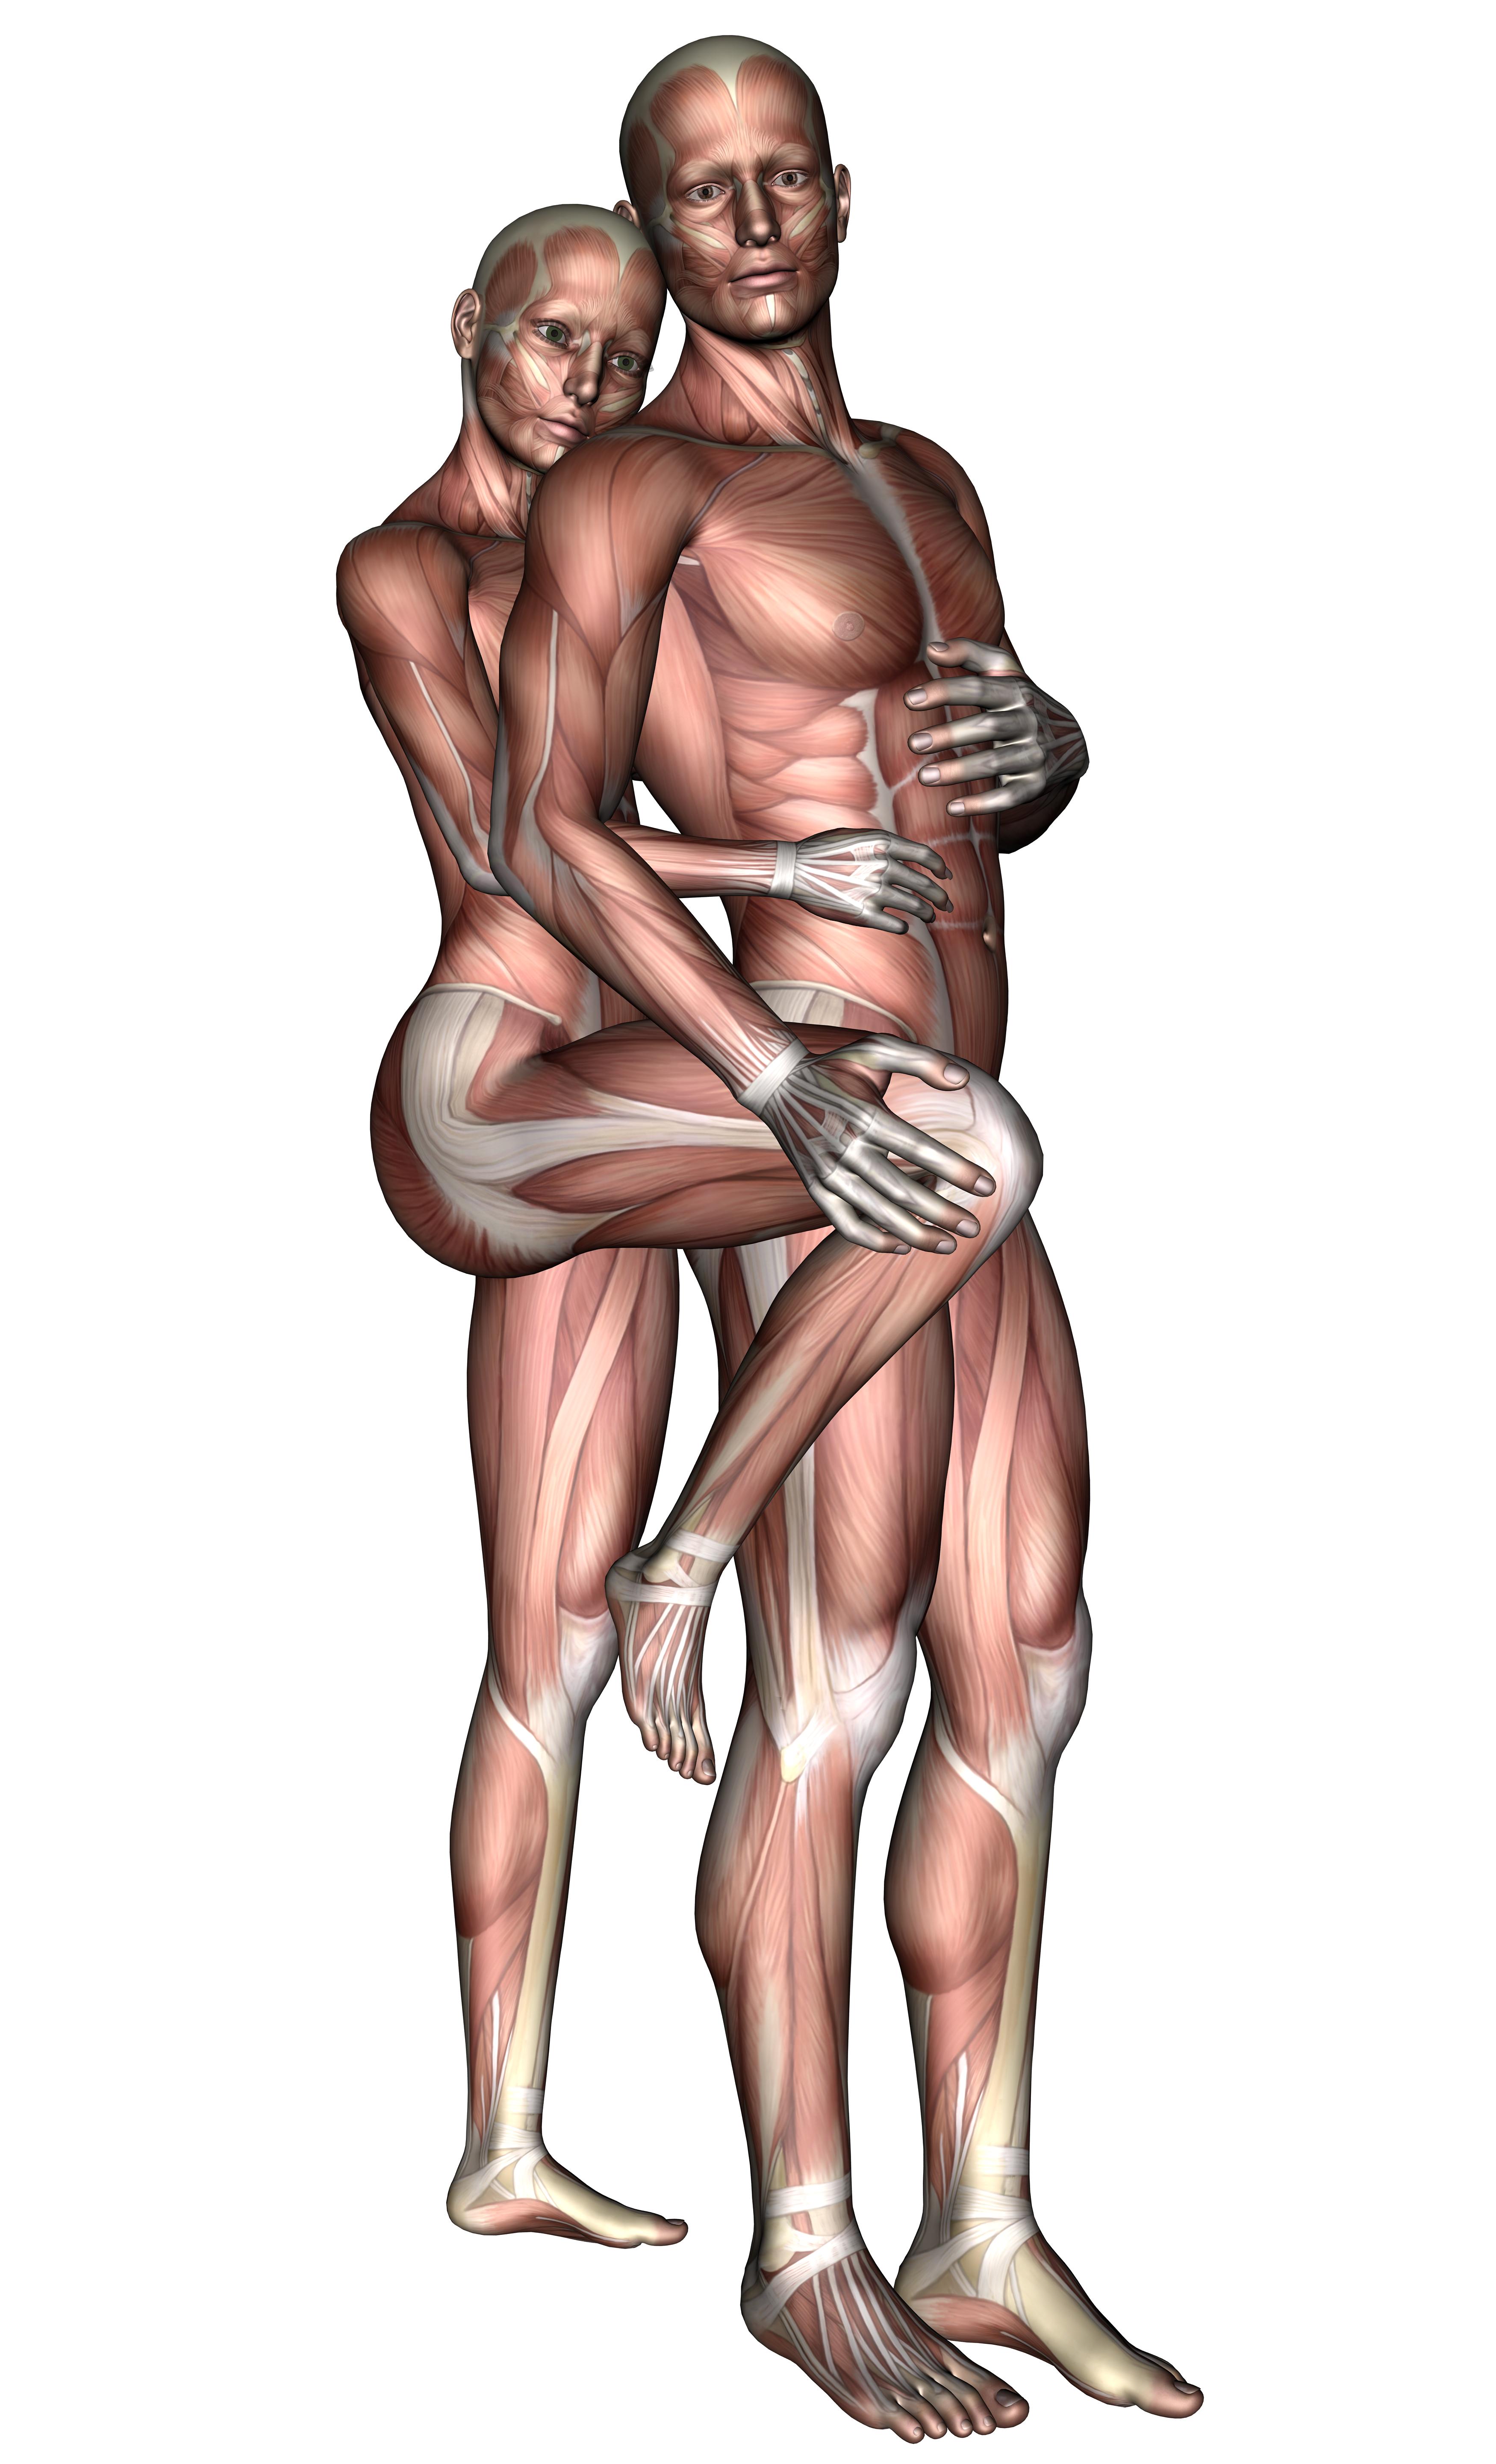 Lovers 2, 3d, Anatomy, Female, Love, HQ Photo